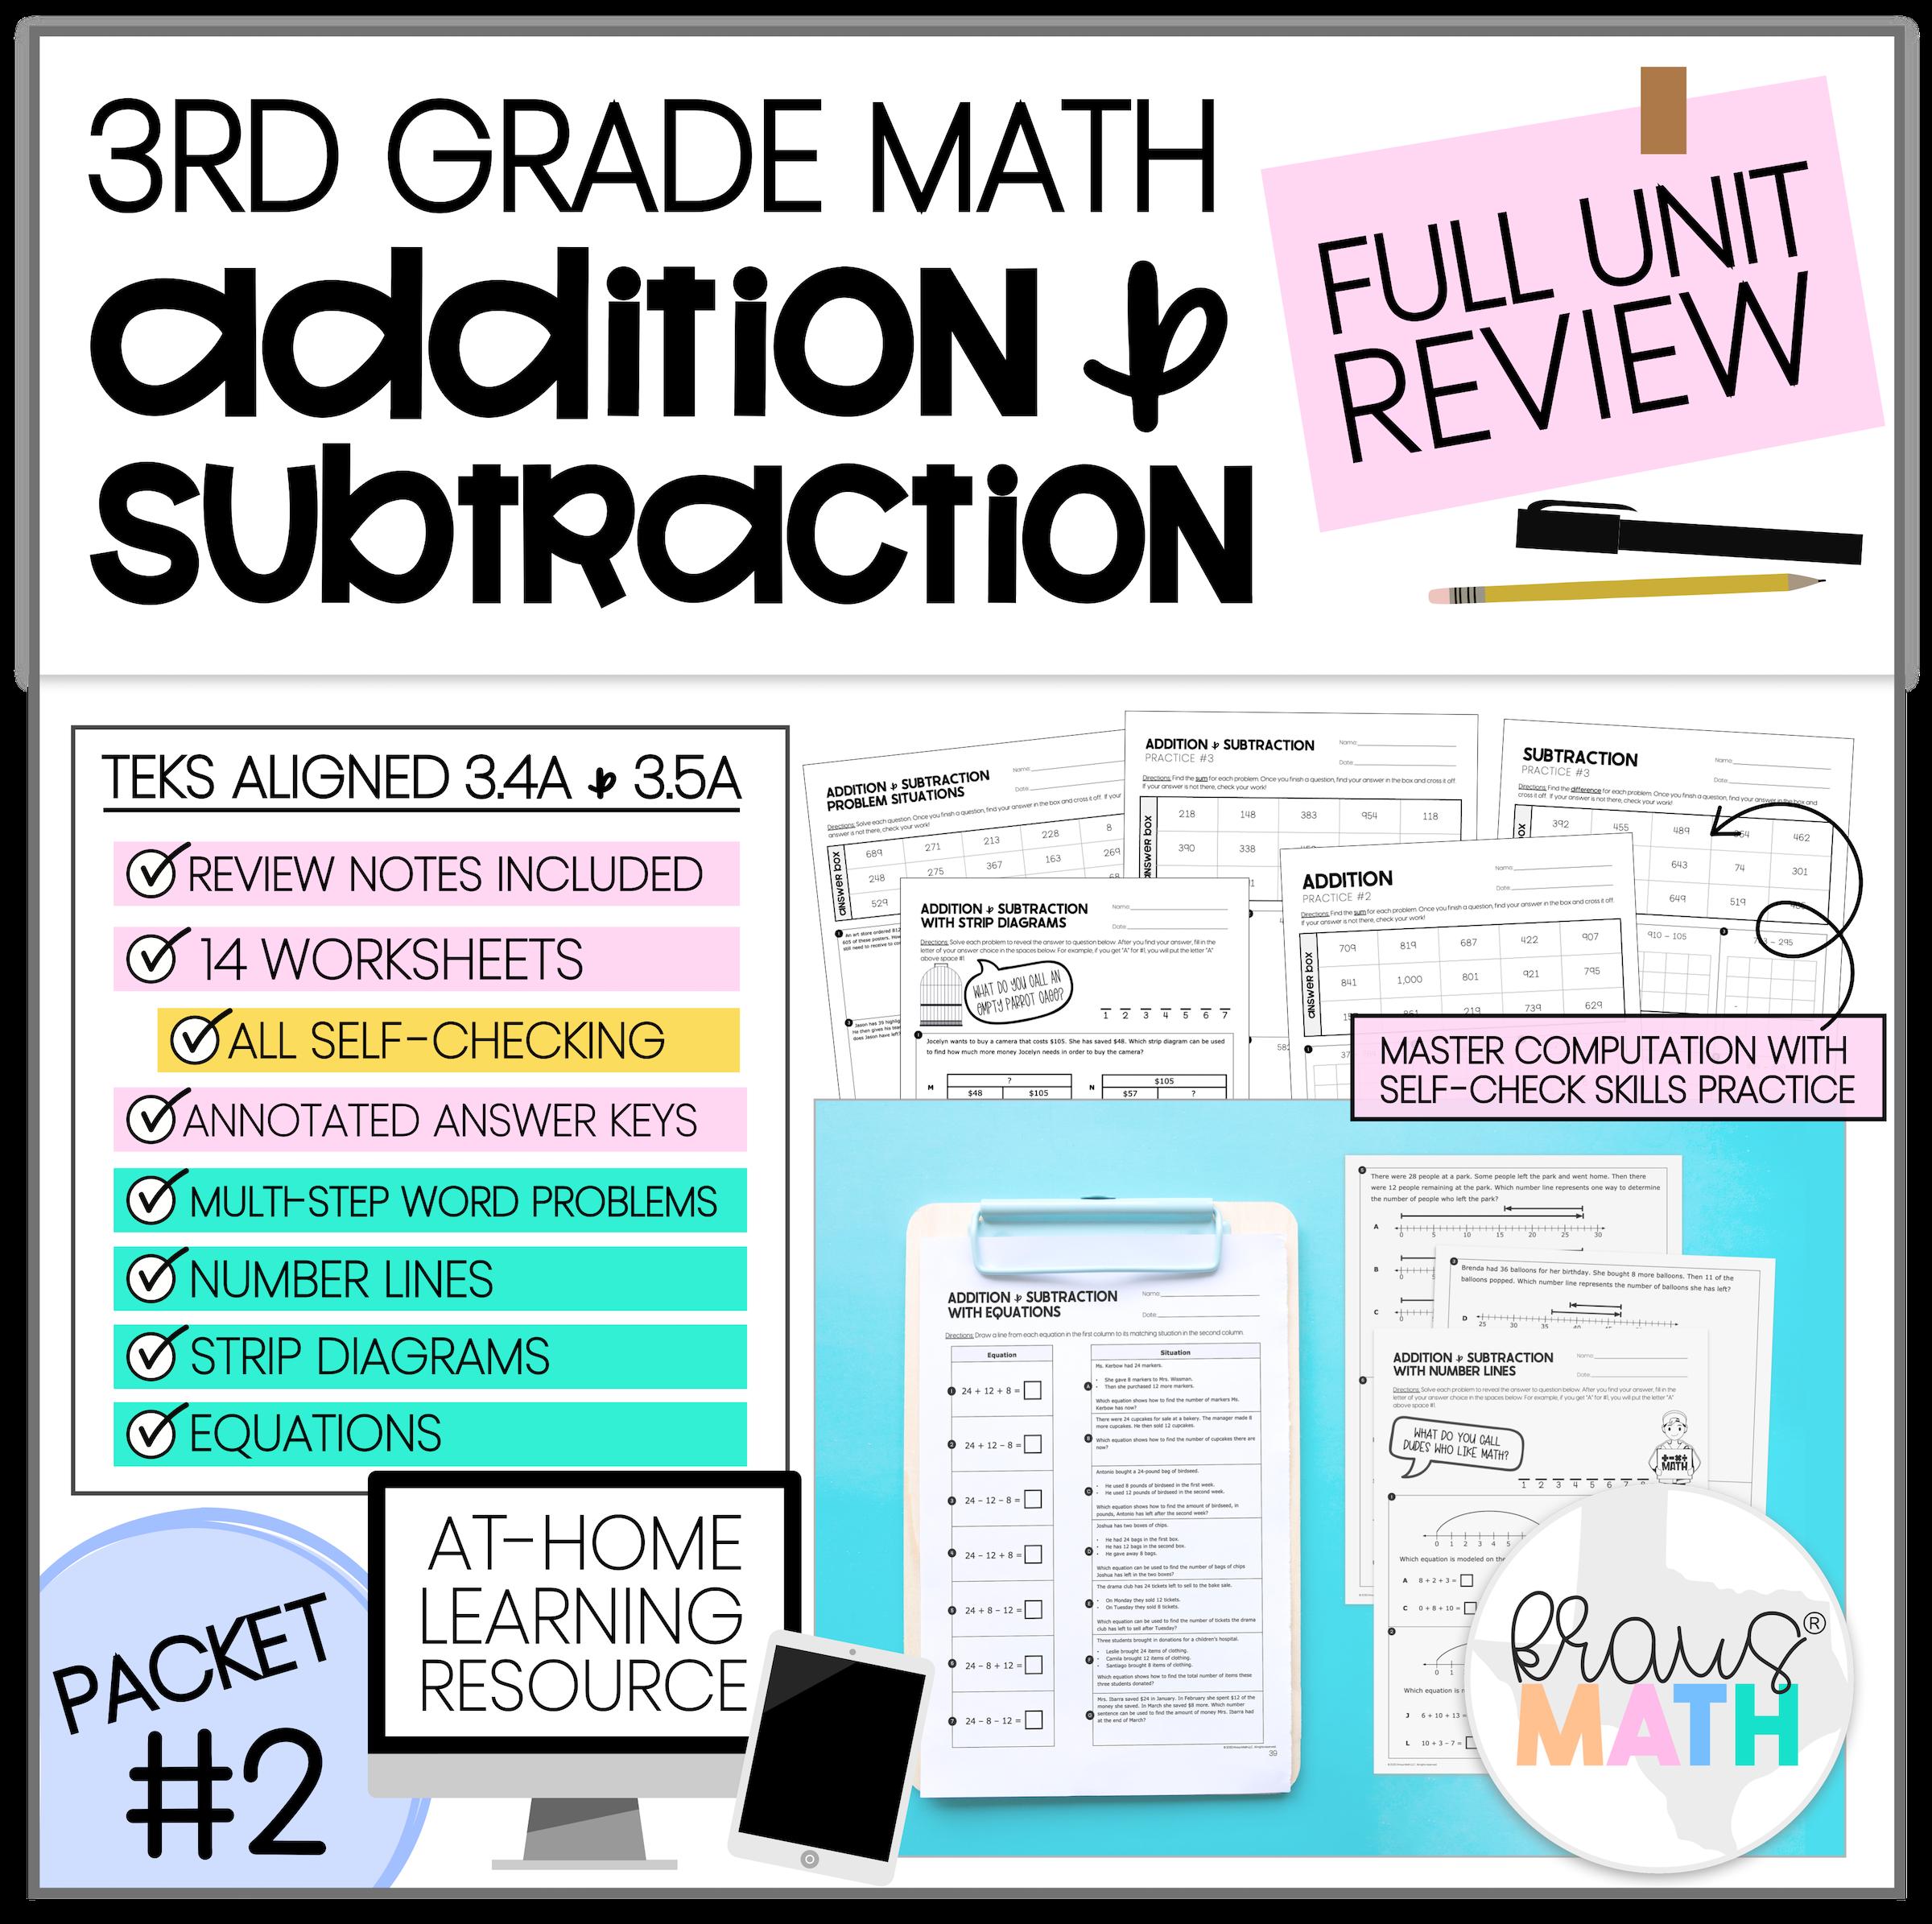 3rd Grade Math Packet 2 Addition Amp Subtraction Teks 3